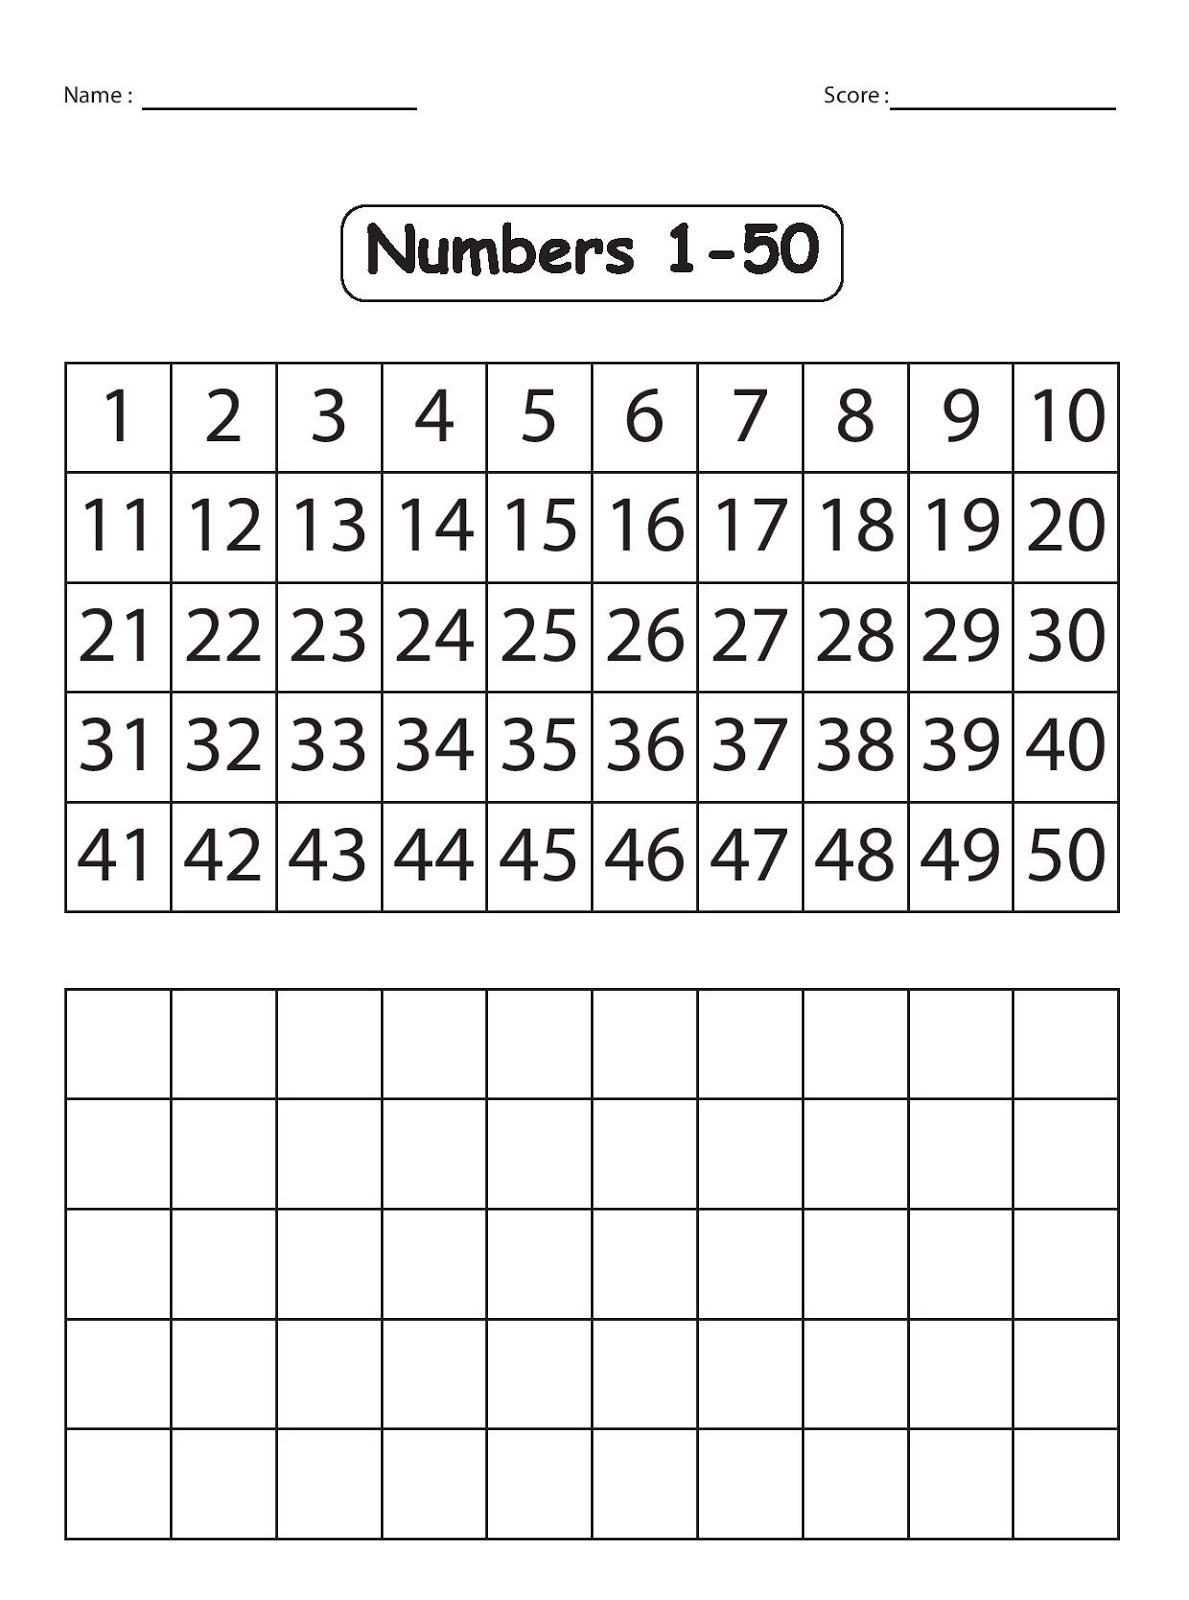 Numbers 1 50 Worksheets | Kids Activities